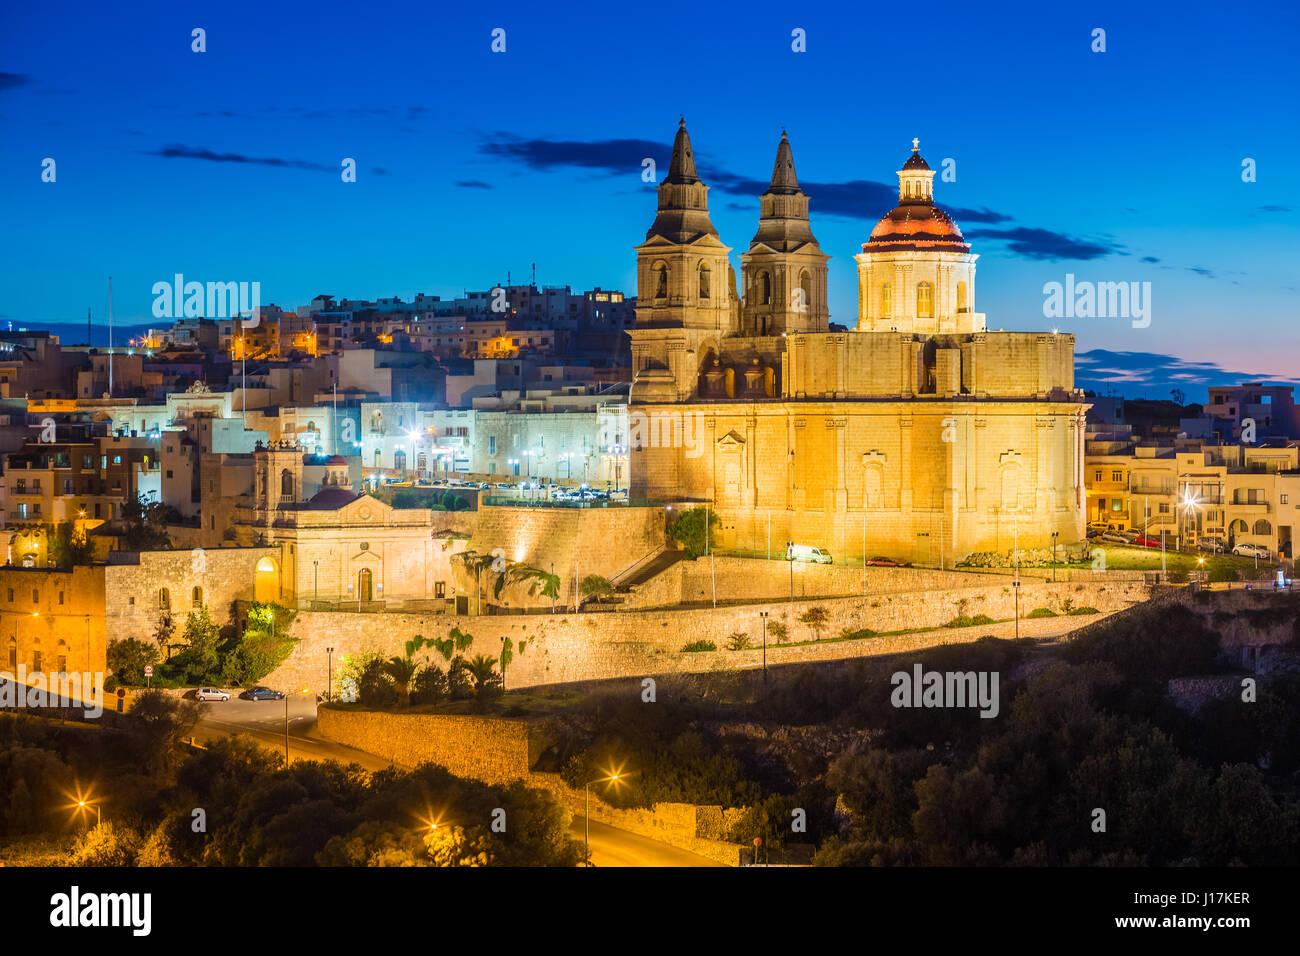 Il-Mellieha, Malta - The Mellieha Parish Church at blue hour - Stock Image